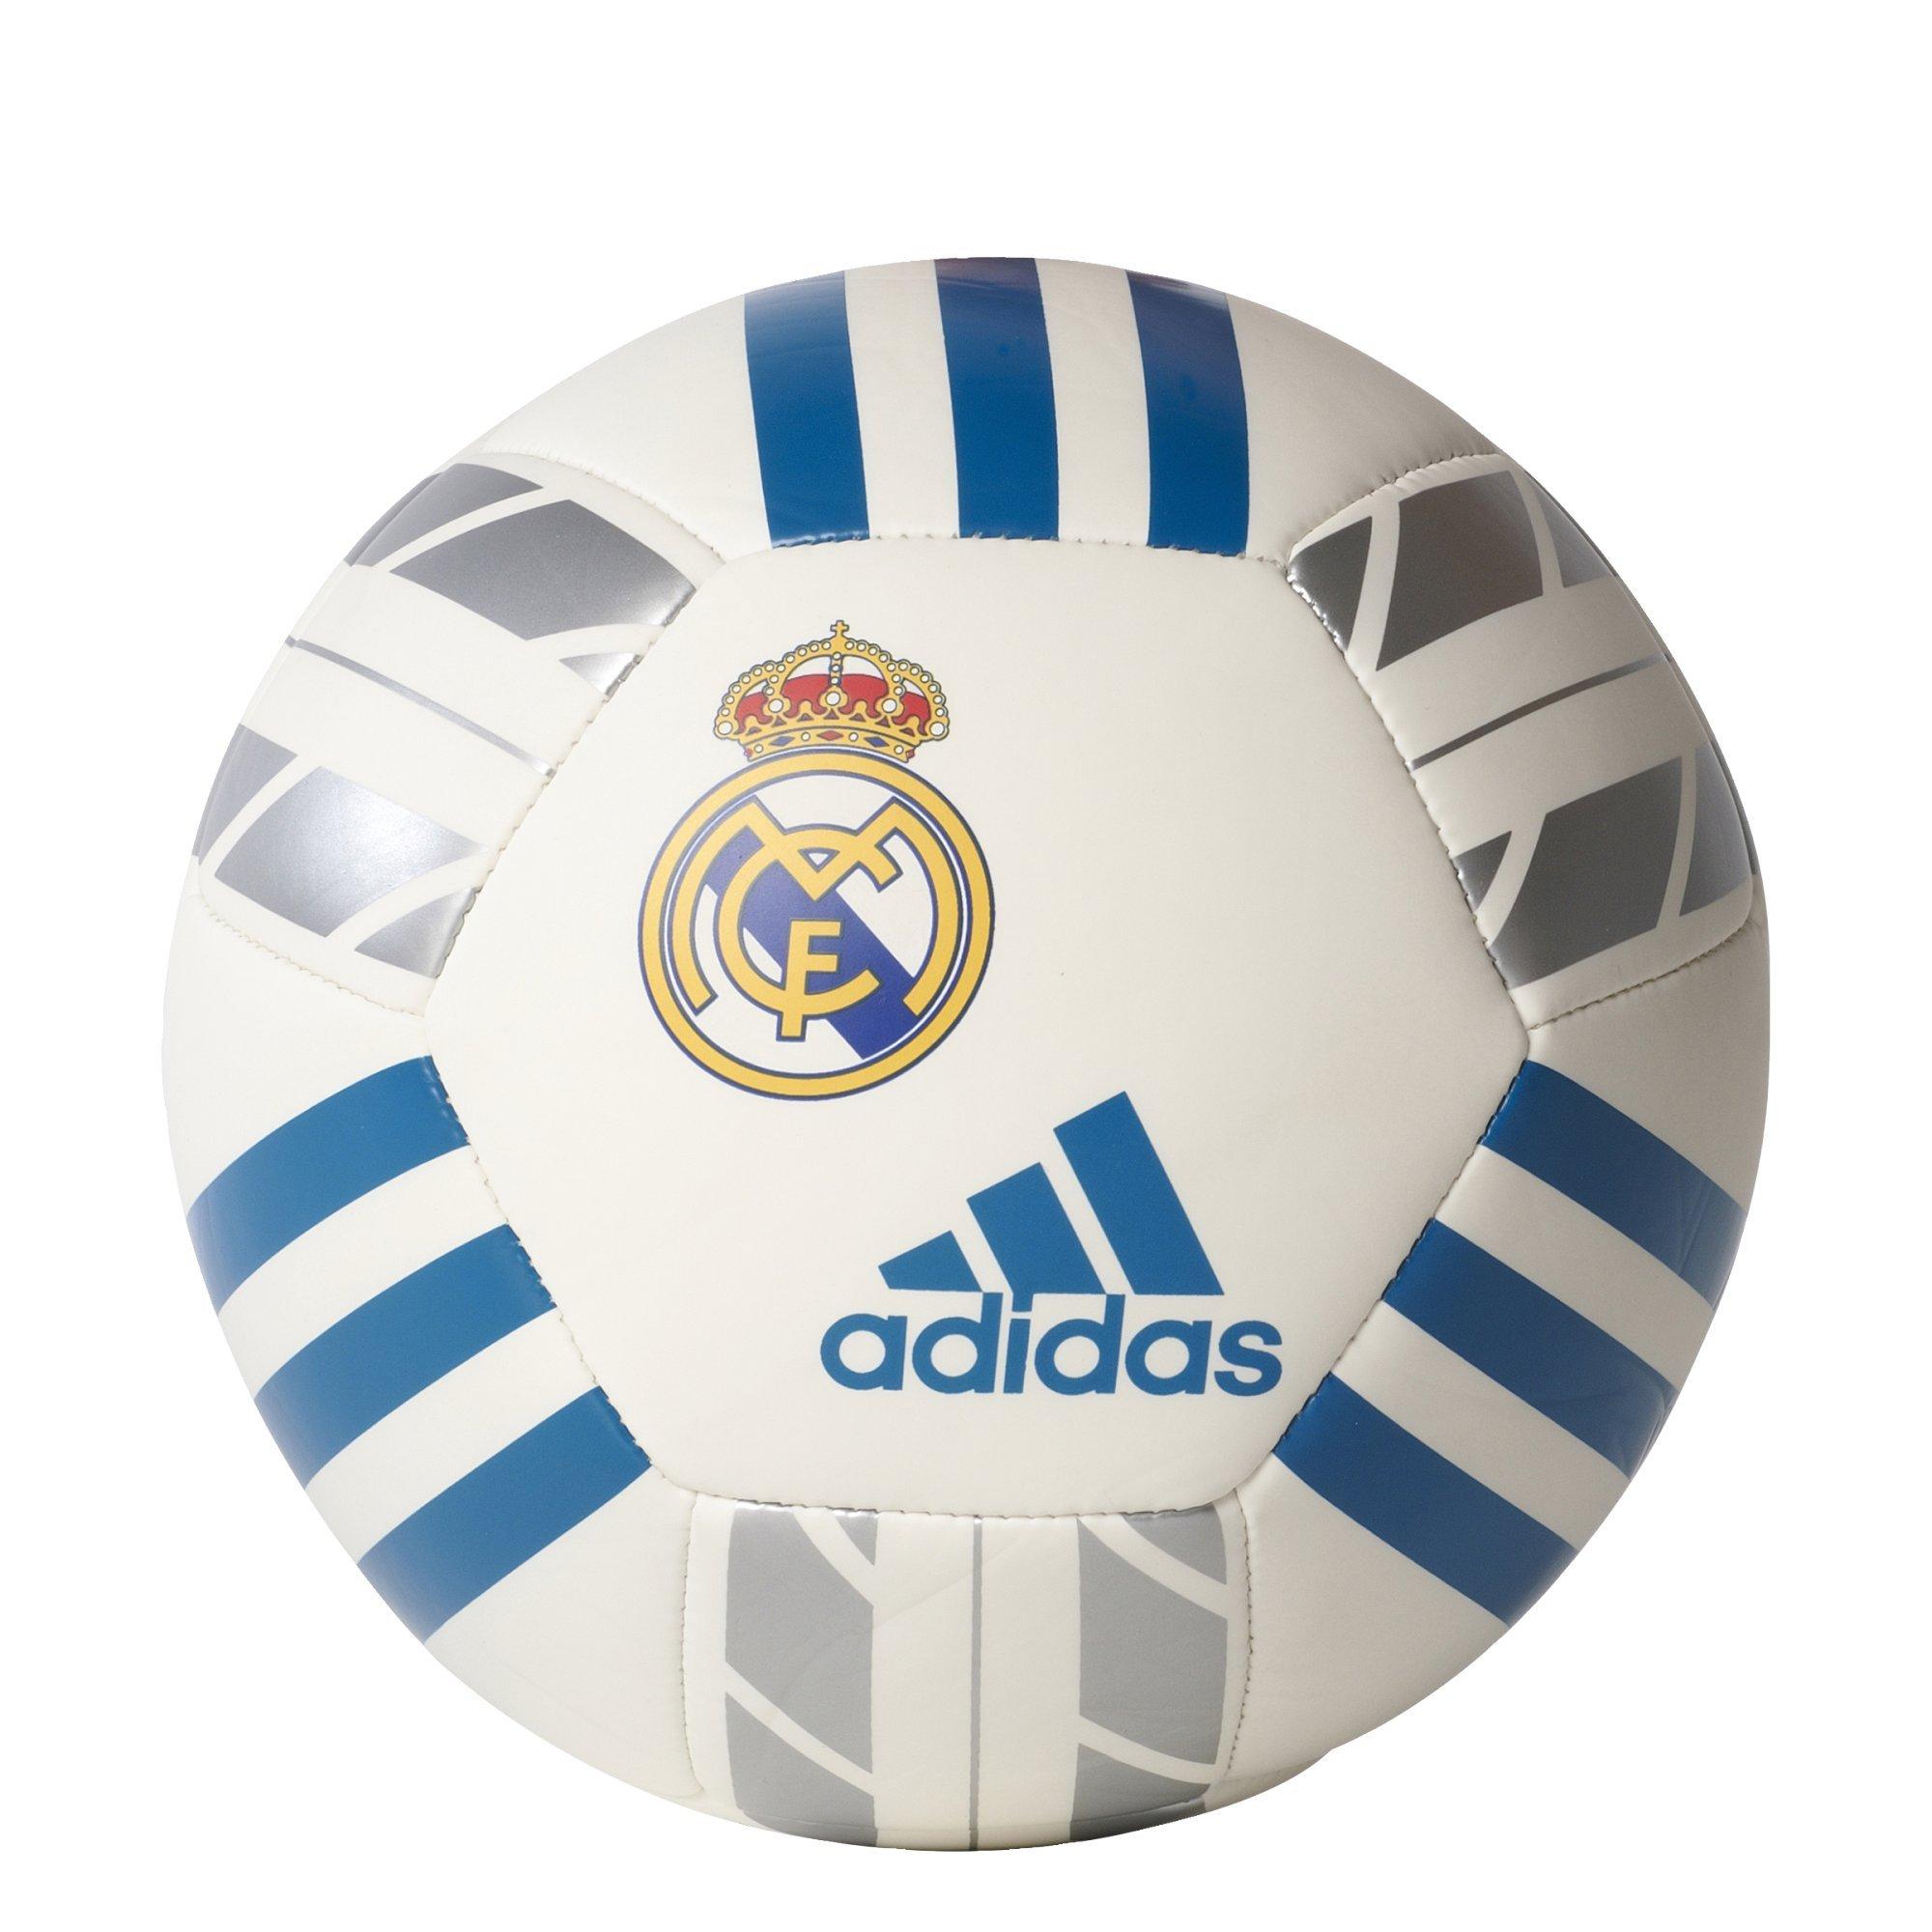 adidas Performance Real Madrid Soccer Ball, White/Vivid Teal/Silver Metallic, 1